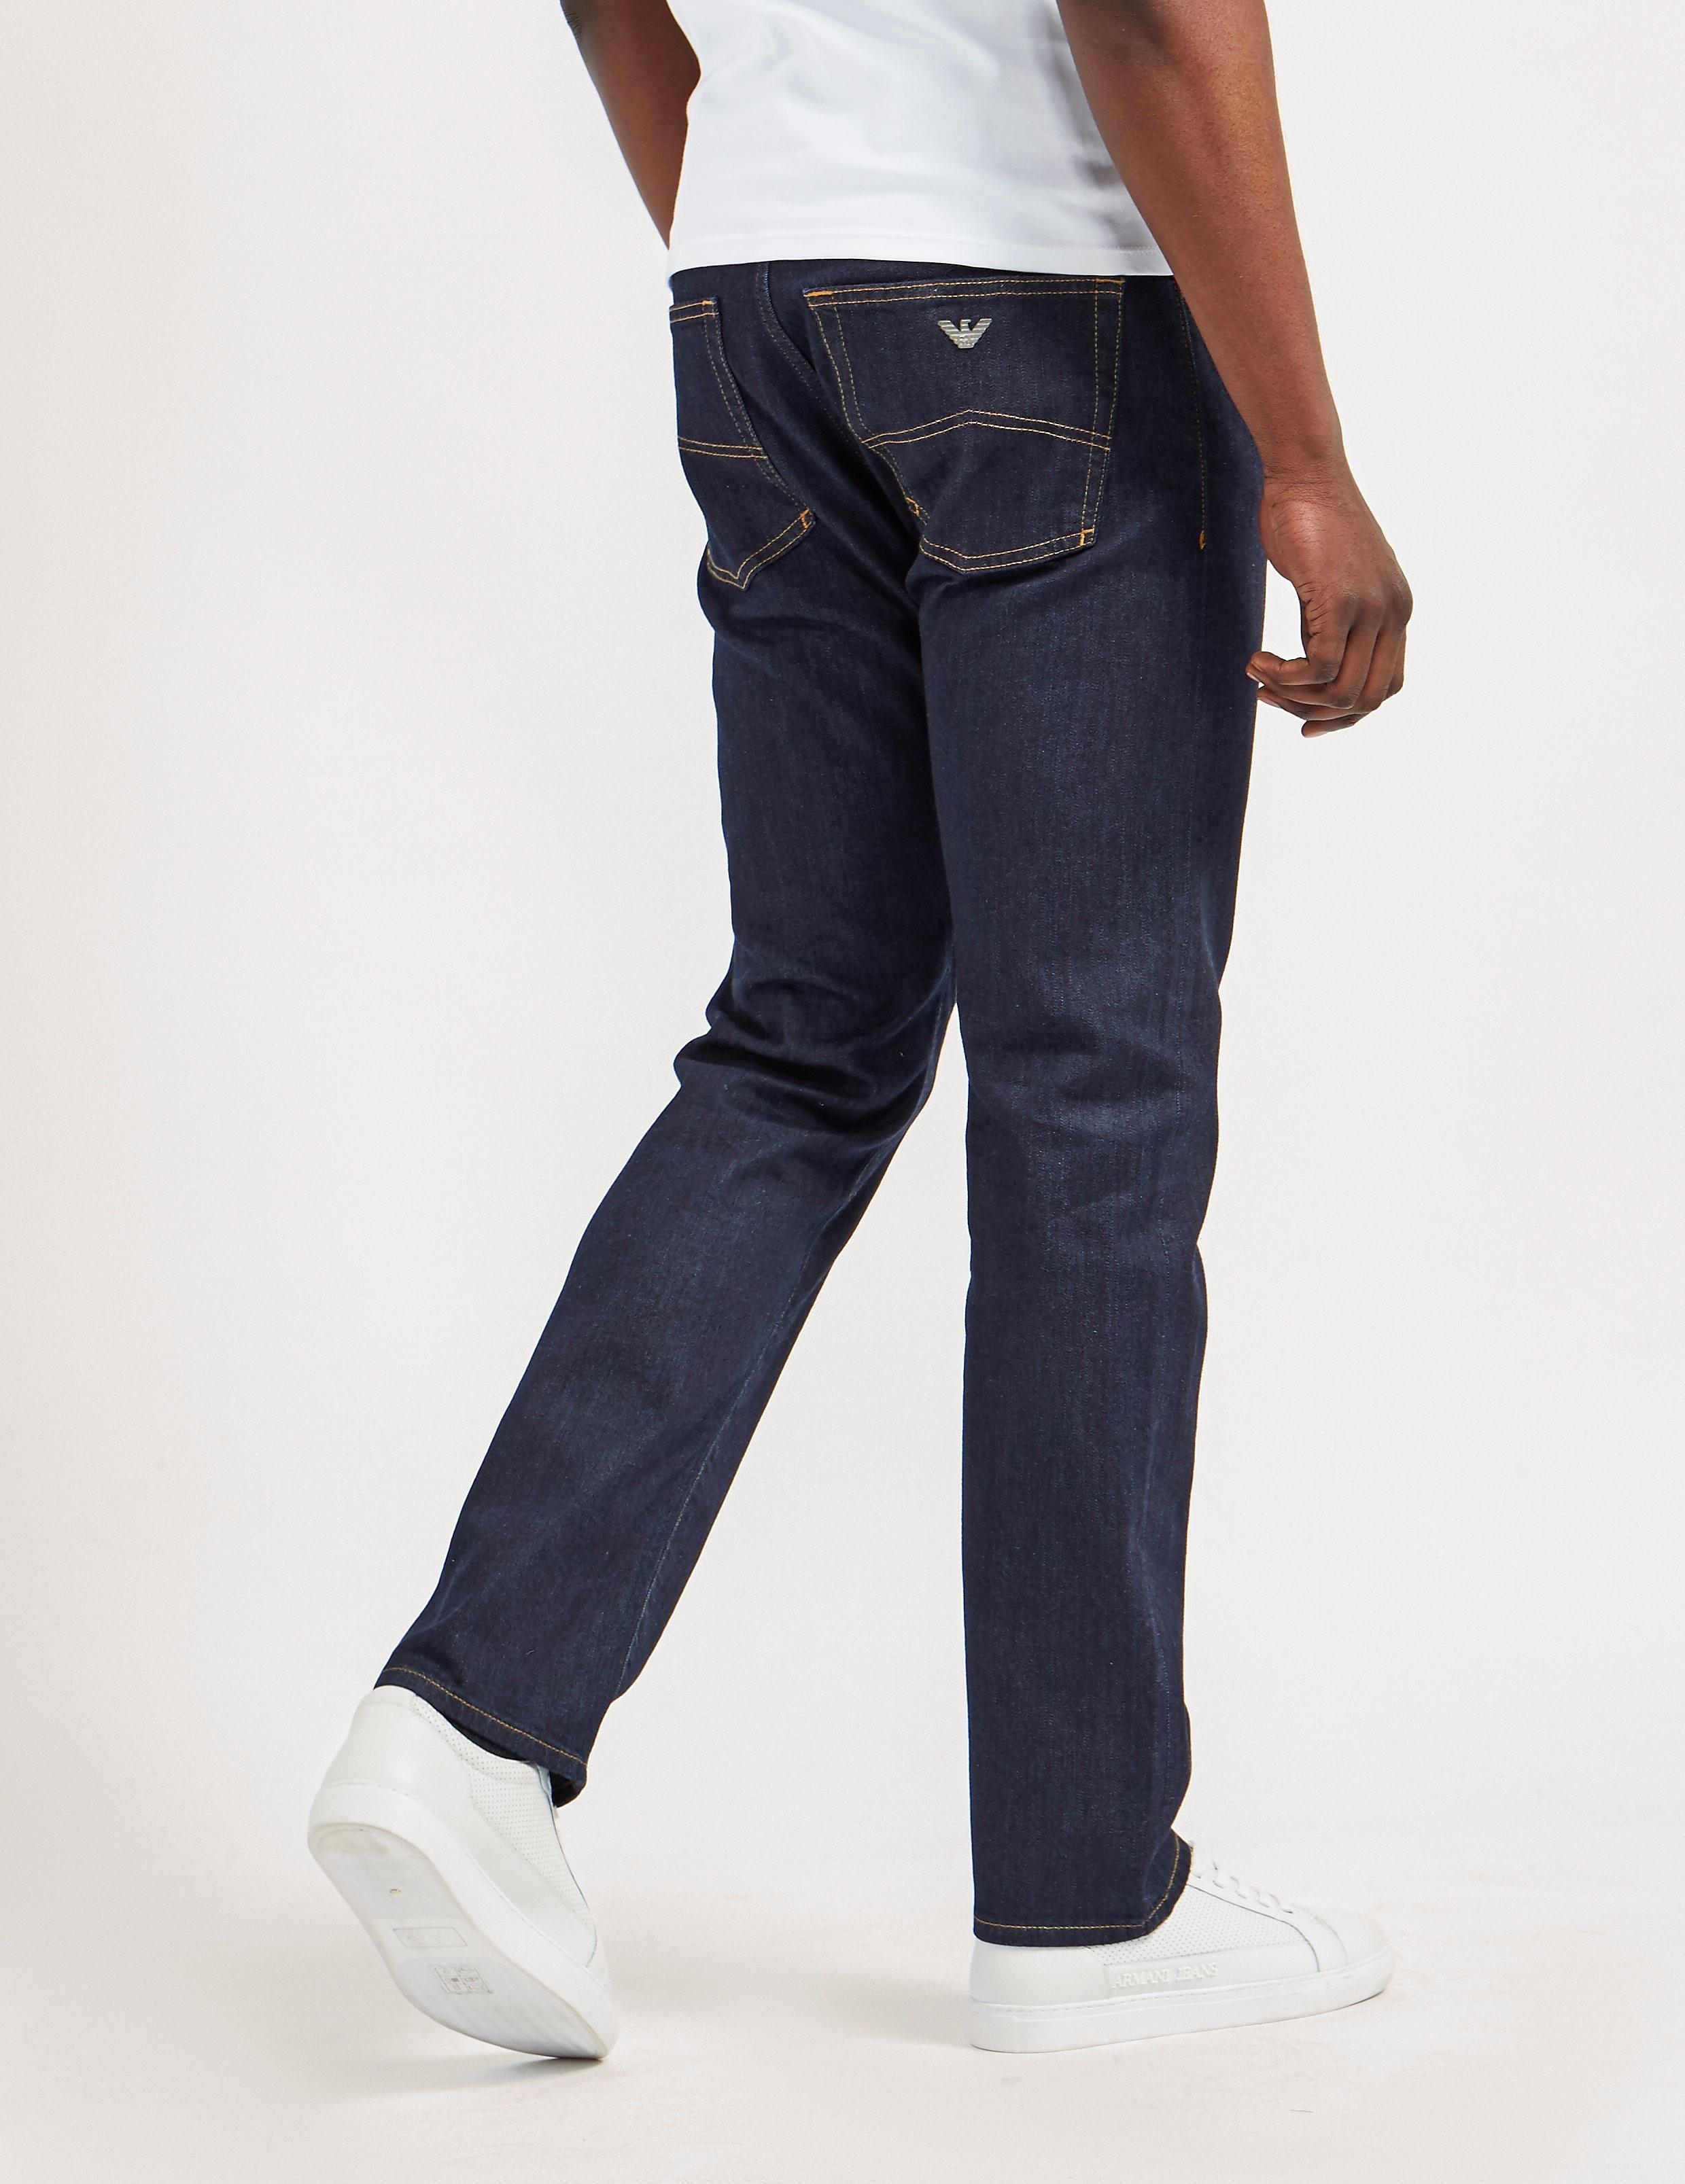 Armani Jeans J45 Regular Jeans